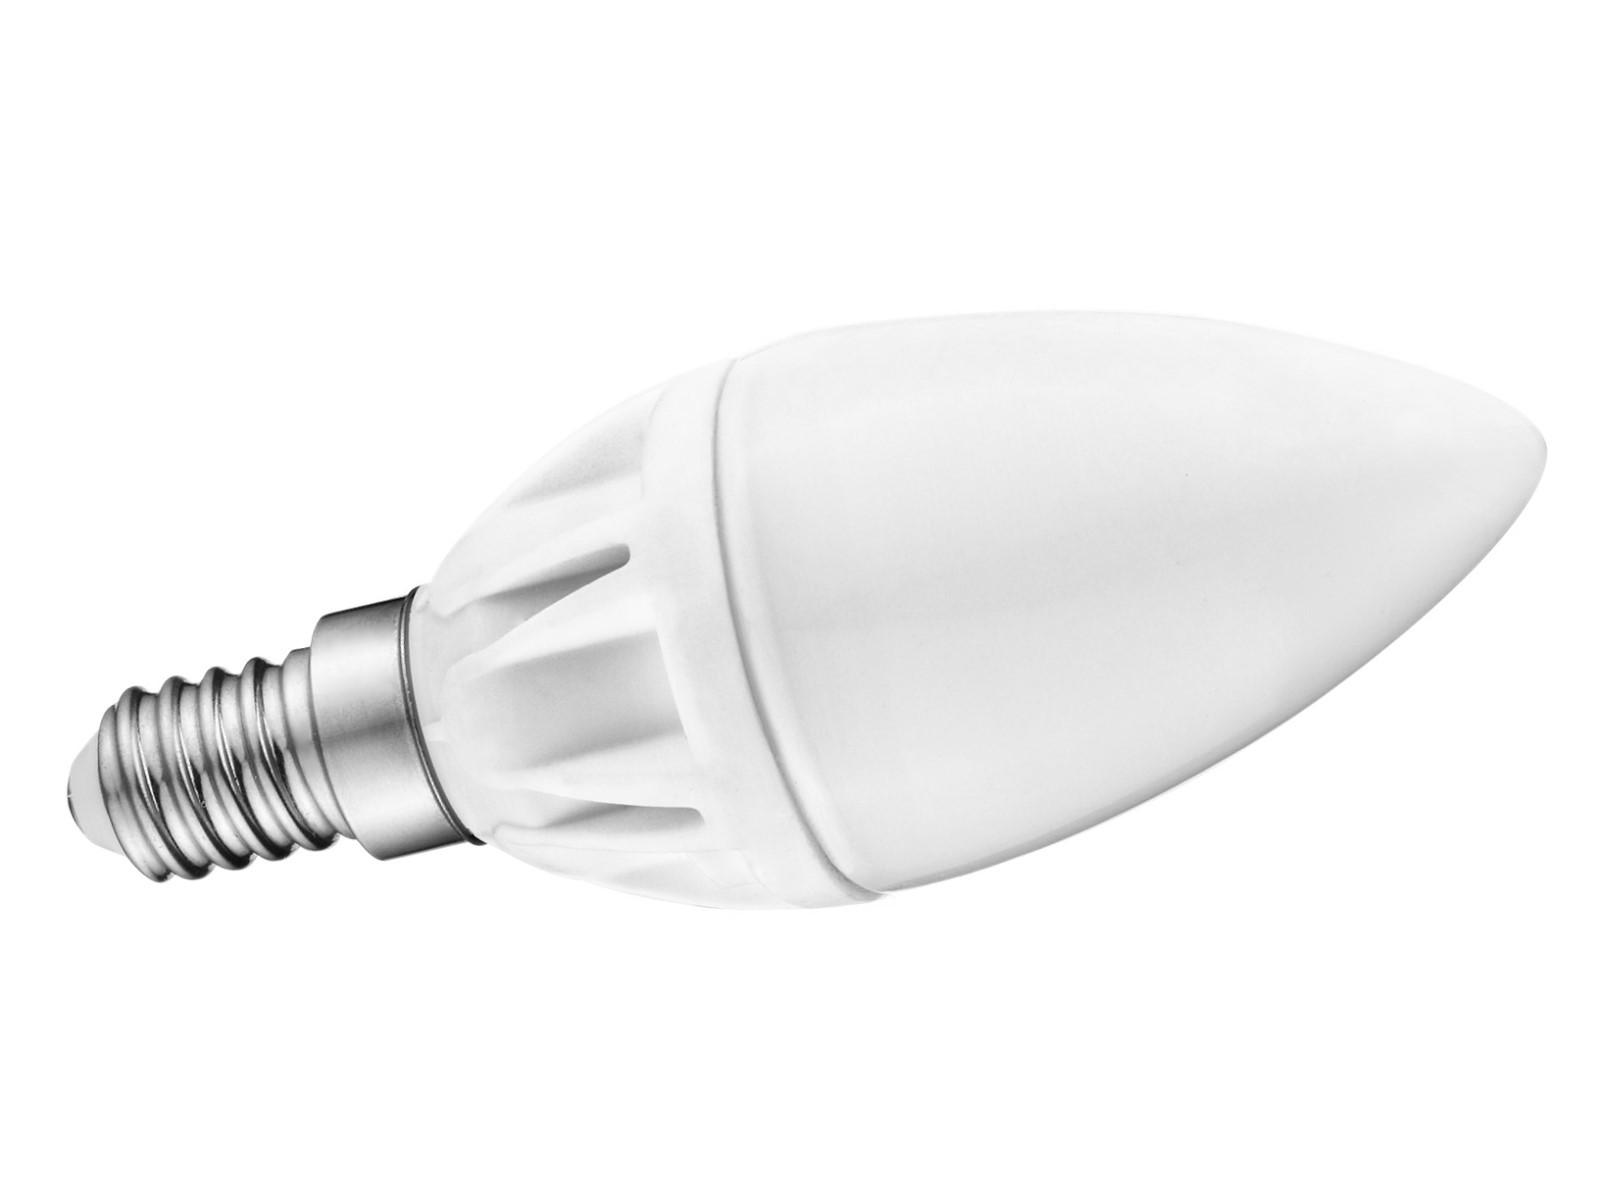 led kerze leuchtmittel matt 3w smd led e14 fassung 249 lumen ersetzt 25w gl hlampe warm wei. Black Bedroom Furniture Sets. Home Design Ideas